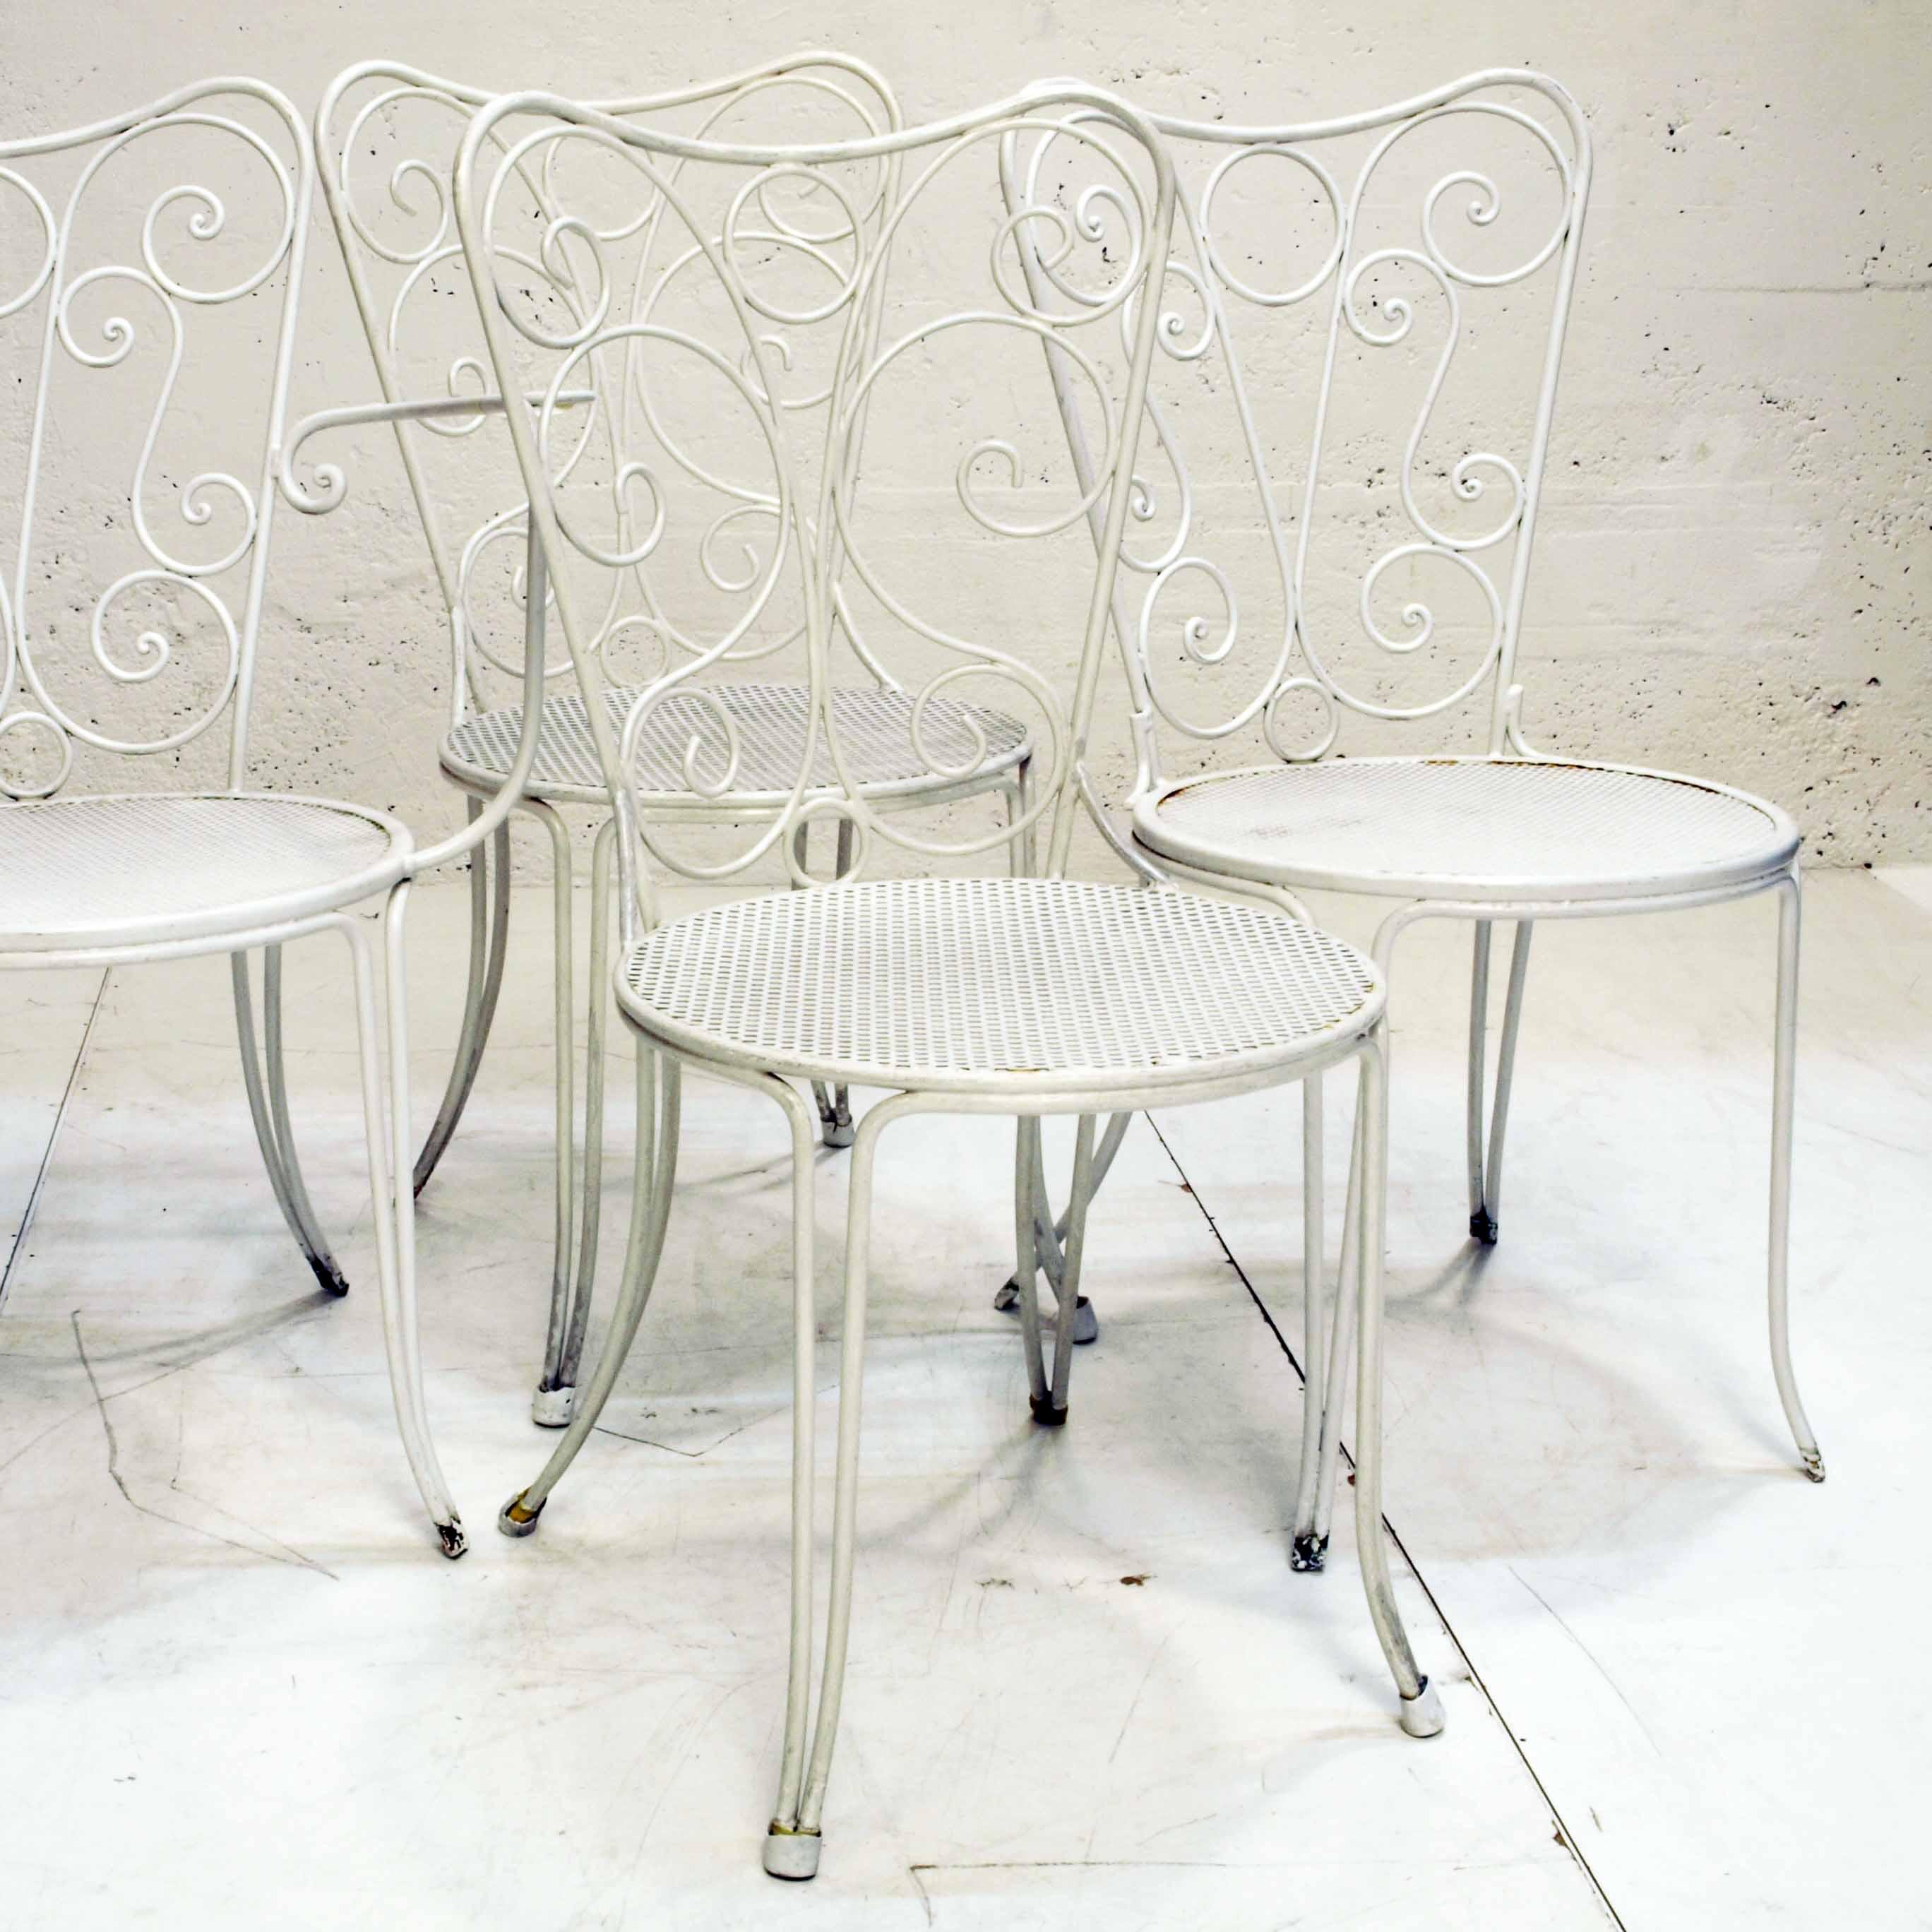 Fantastisch 4er Set Gartenstühle, Metall, Weiss, Jugendstil, Ohne Armlehne